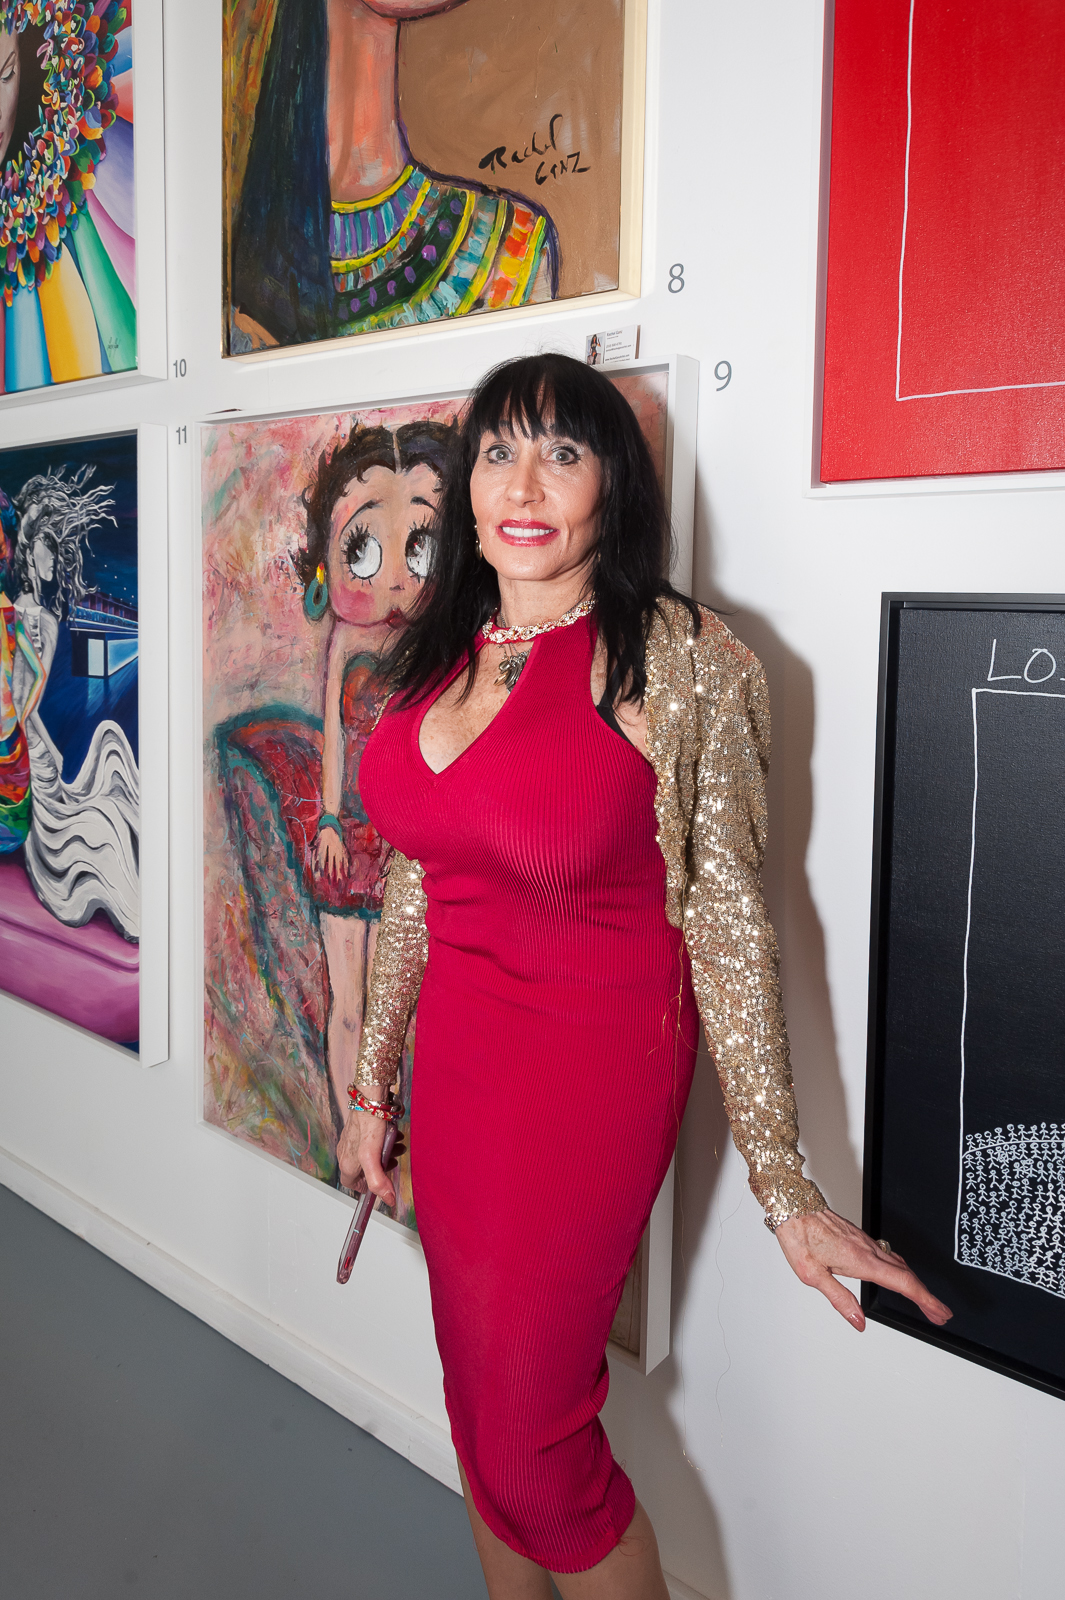 Artist Corner Gallery Feb 13 2019-0482.jpg